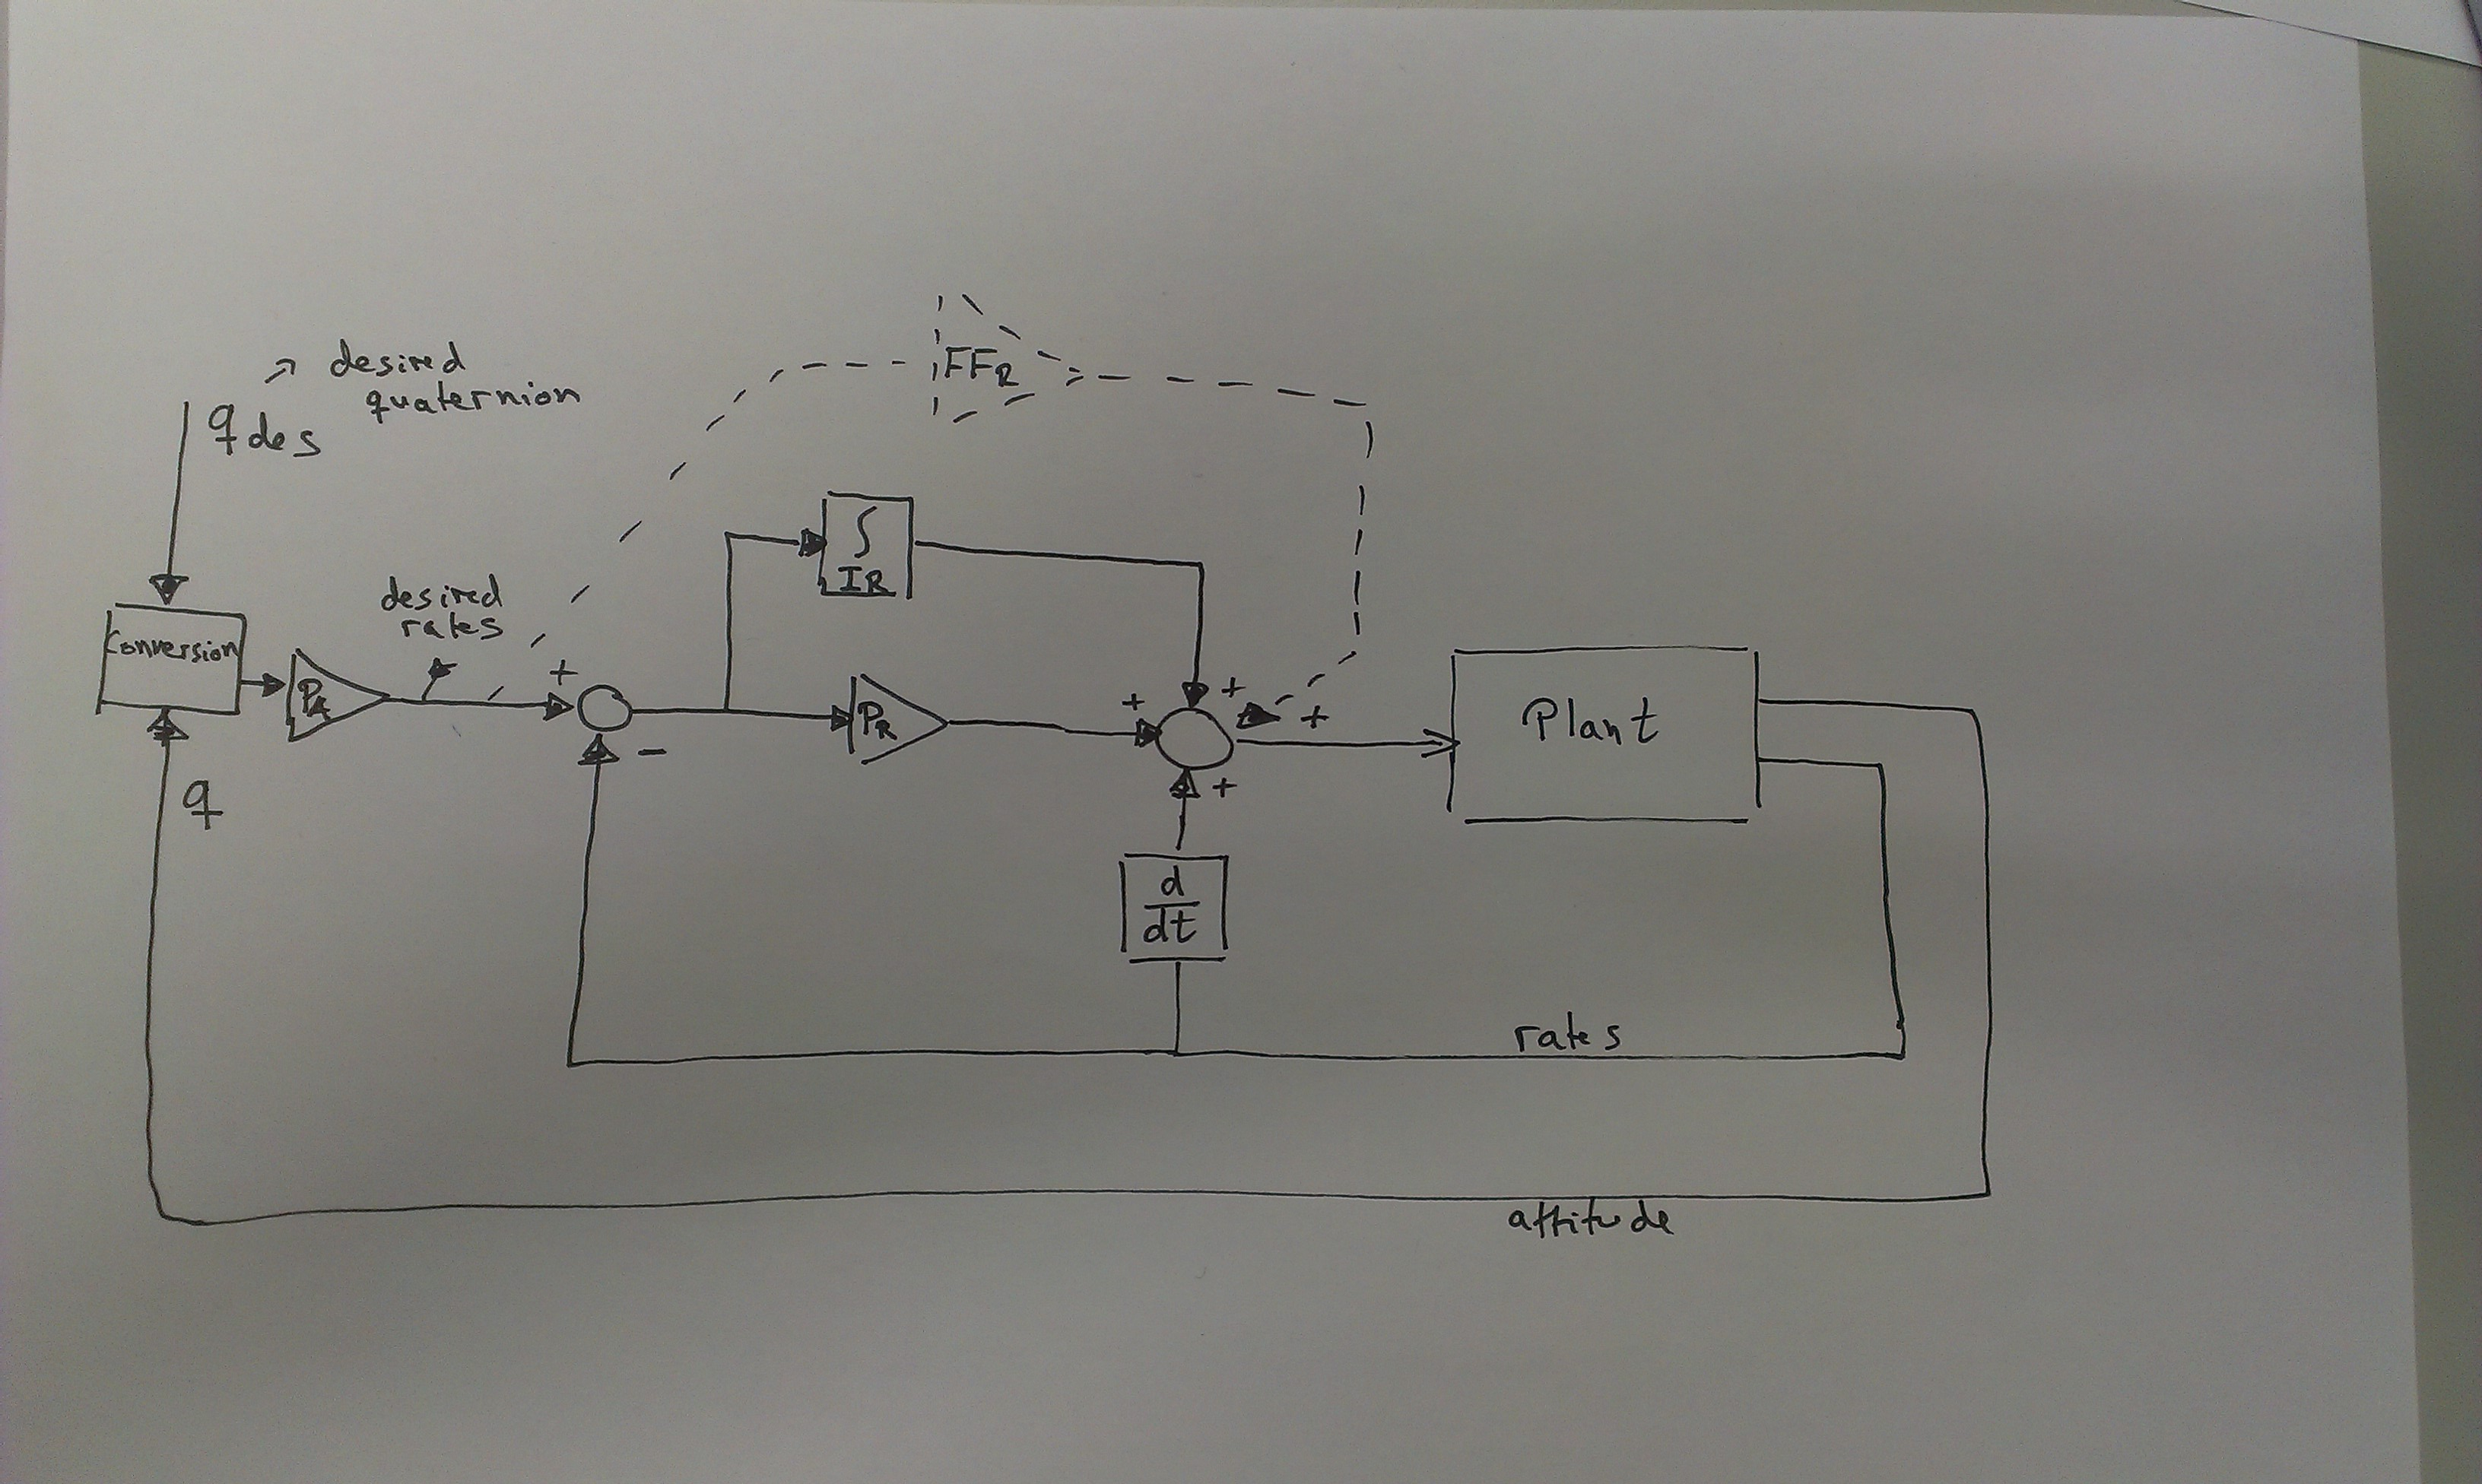 FW Attitude controller Diagram · Issue #8316 · PX4/Firmware · GitHub